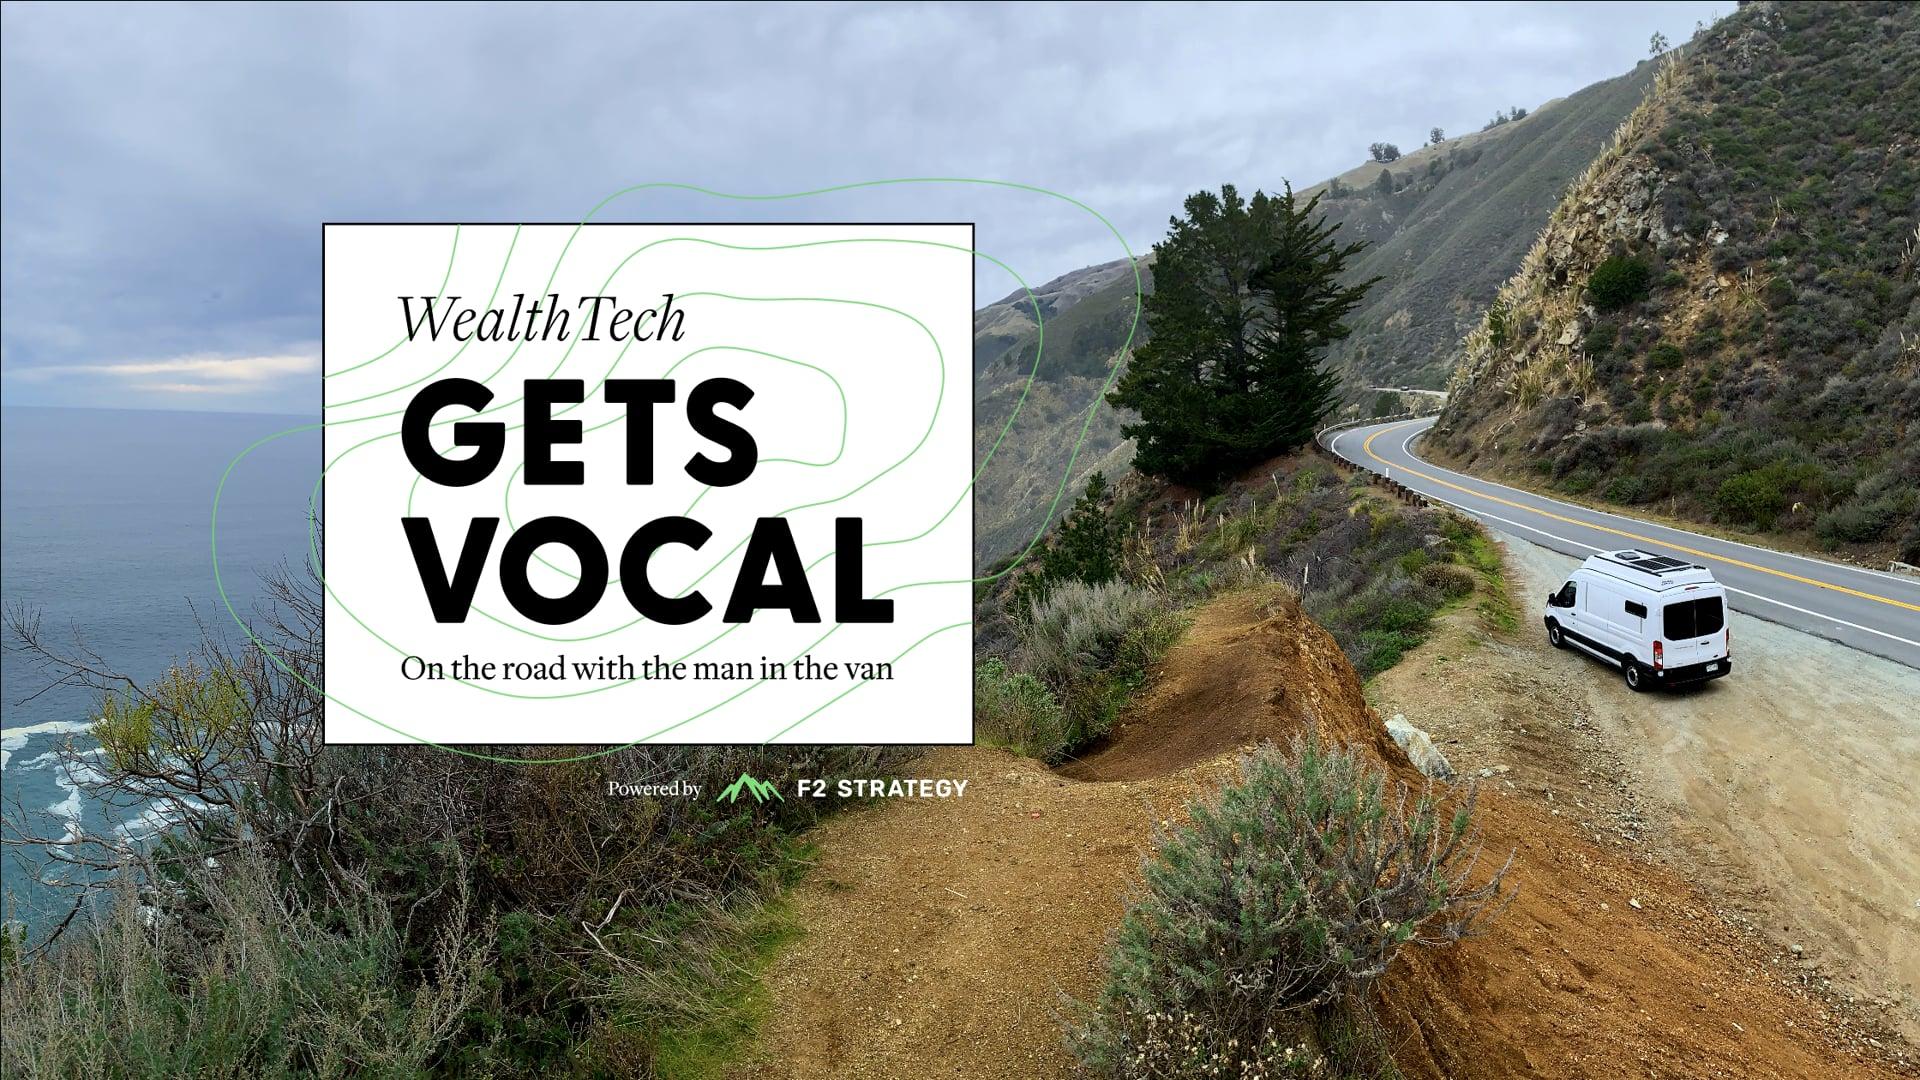 Wealth Tech GETS VOCAL Podcast Trailer (subtitled)